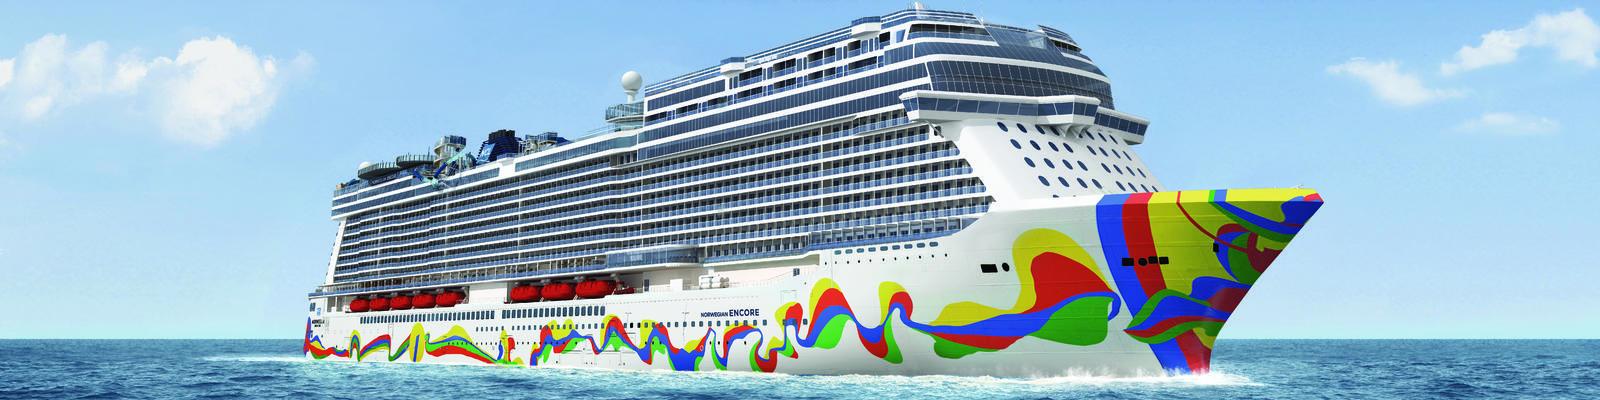 Norwegian Cruise Line Reveals New Italian Restaurant on Norwegian Encore